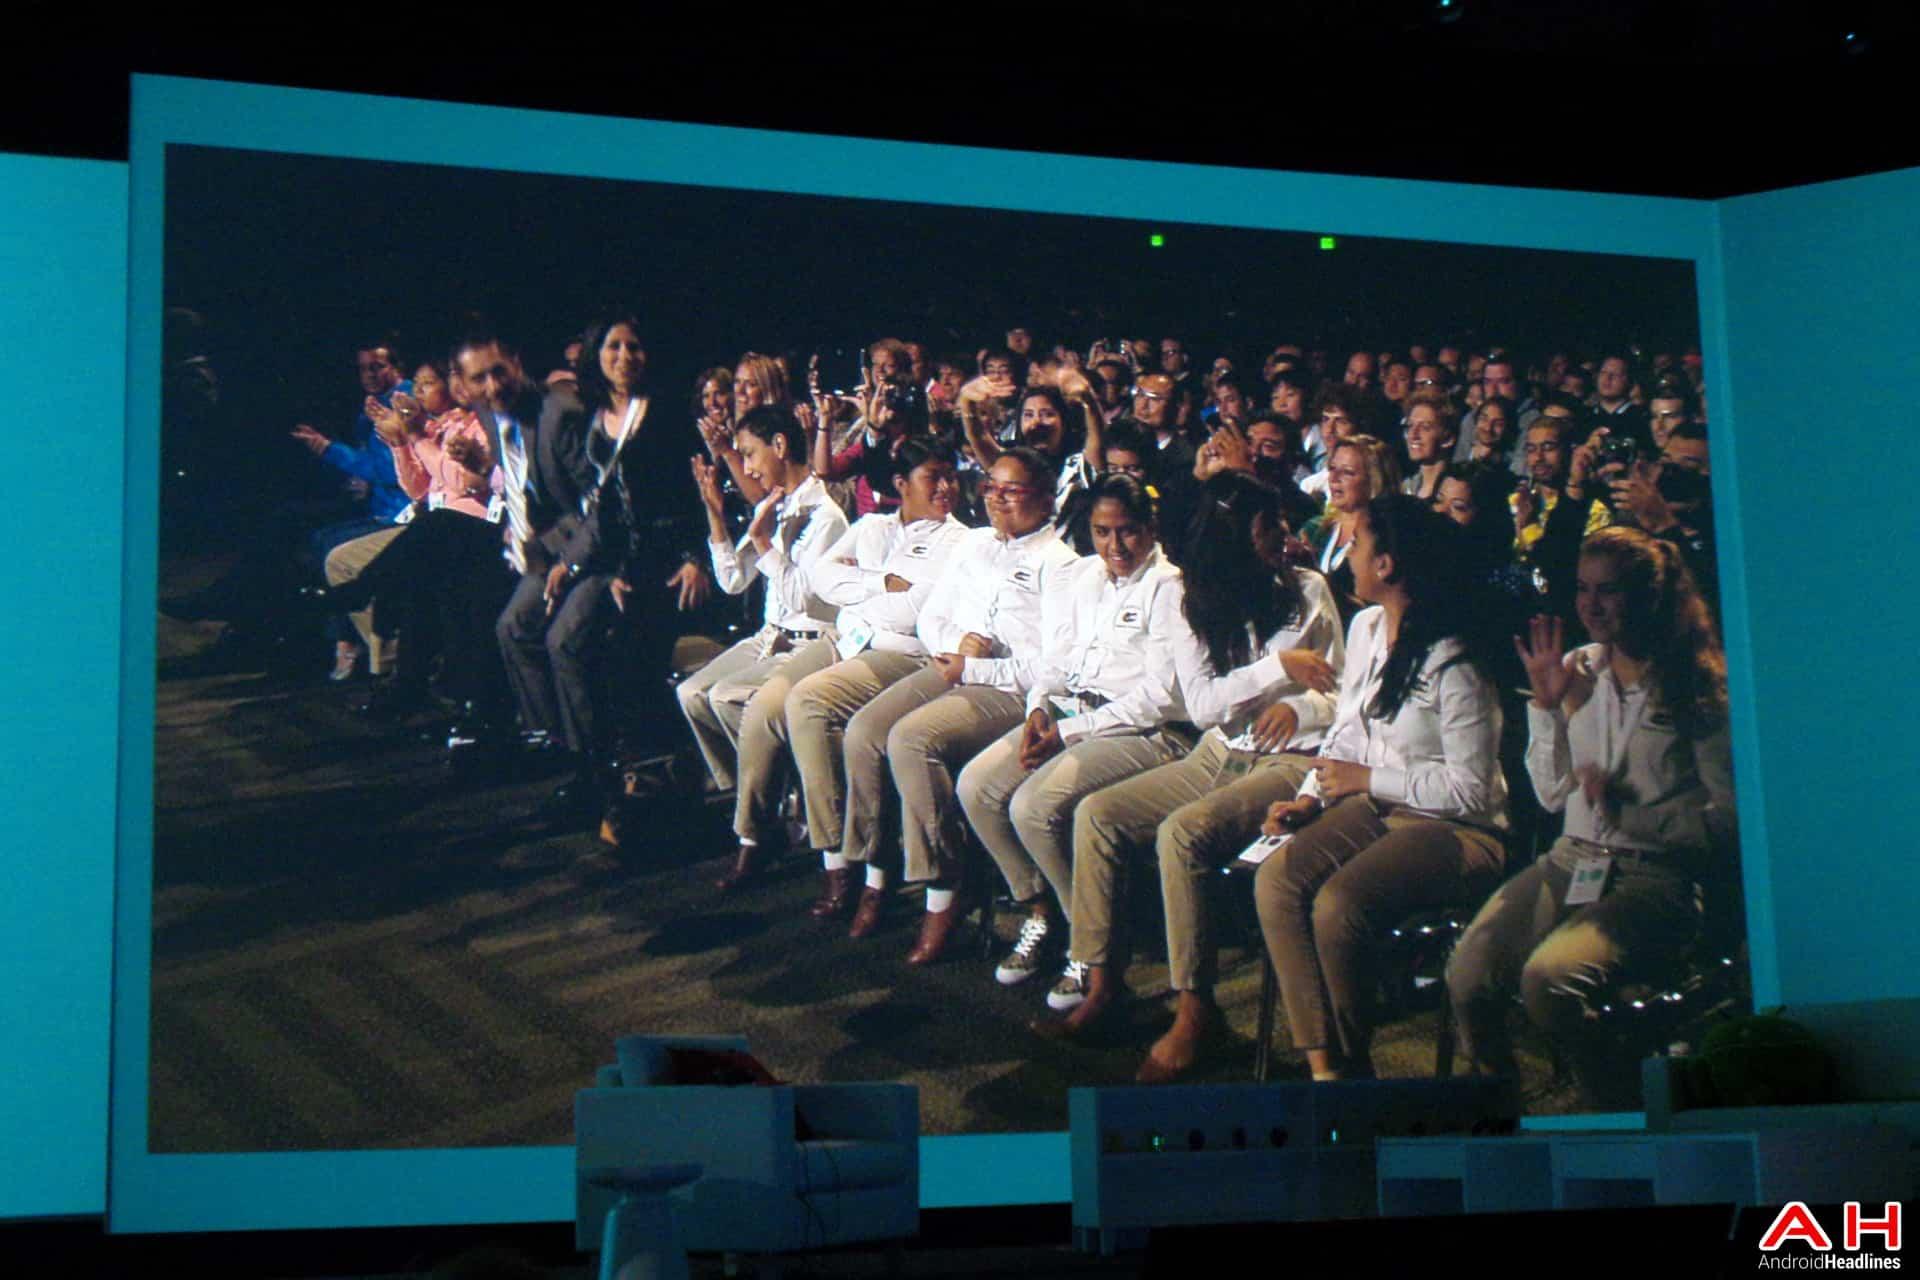 AH Google IO 2014 703 of 5 Chrome People